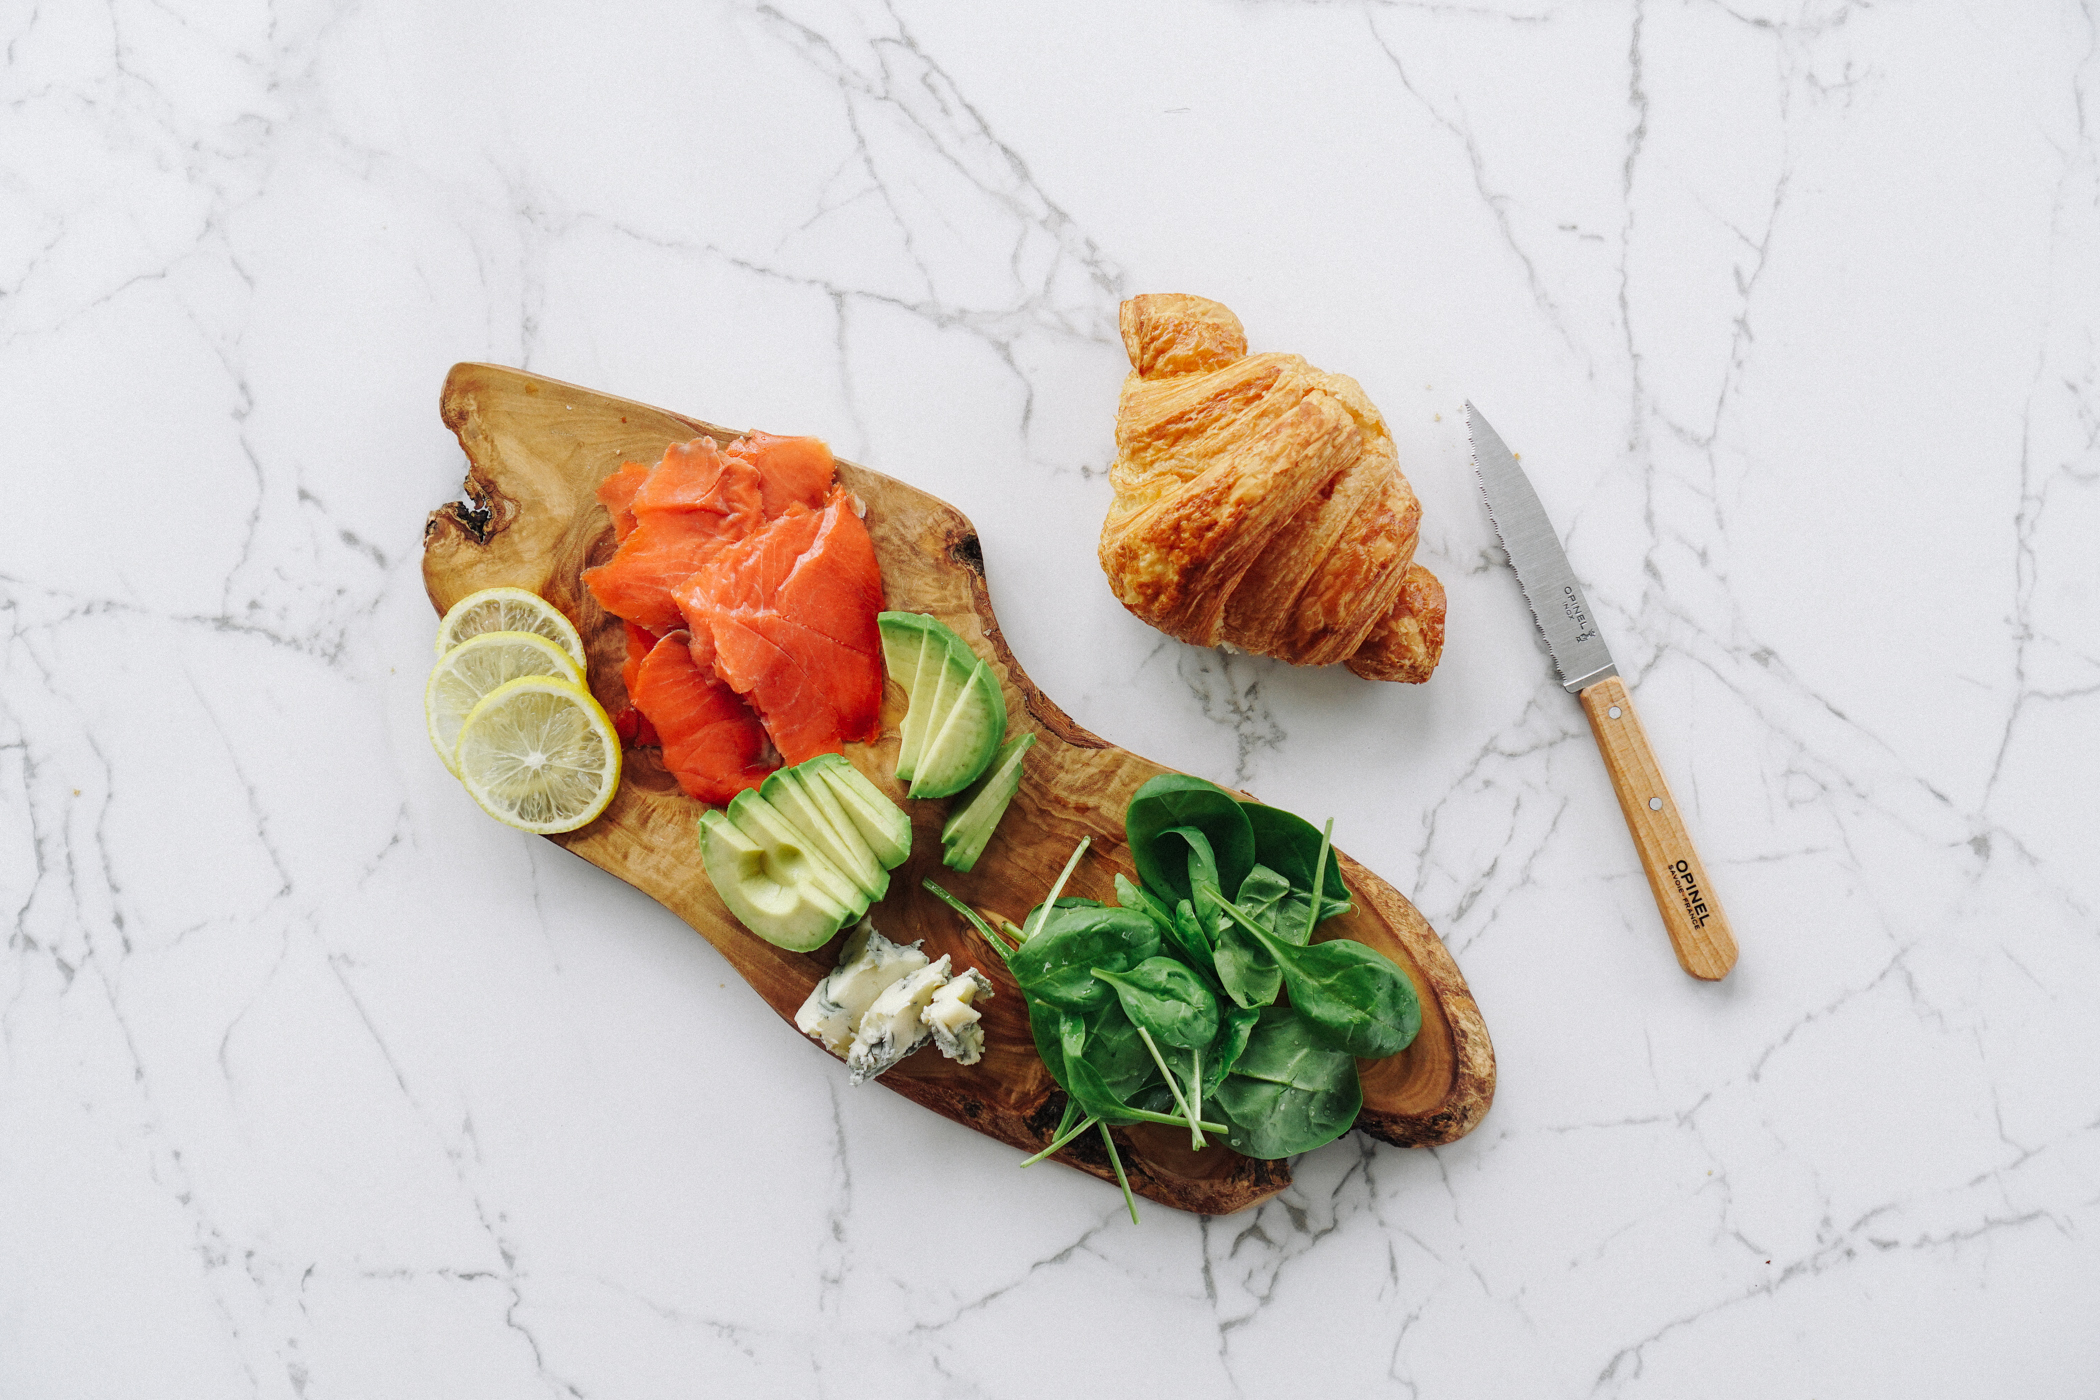 smoked_salmon_avocado_blue_cheese_croissant-2.jpg